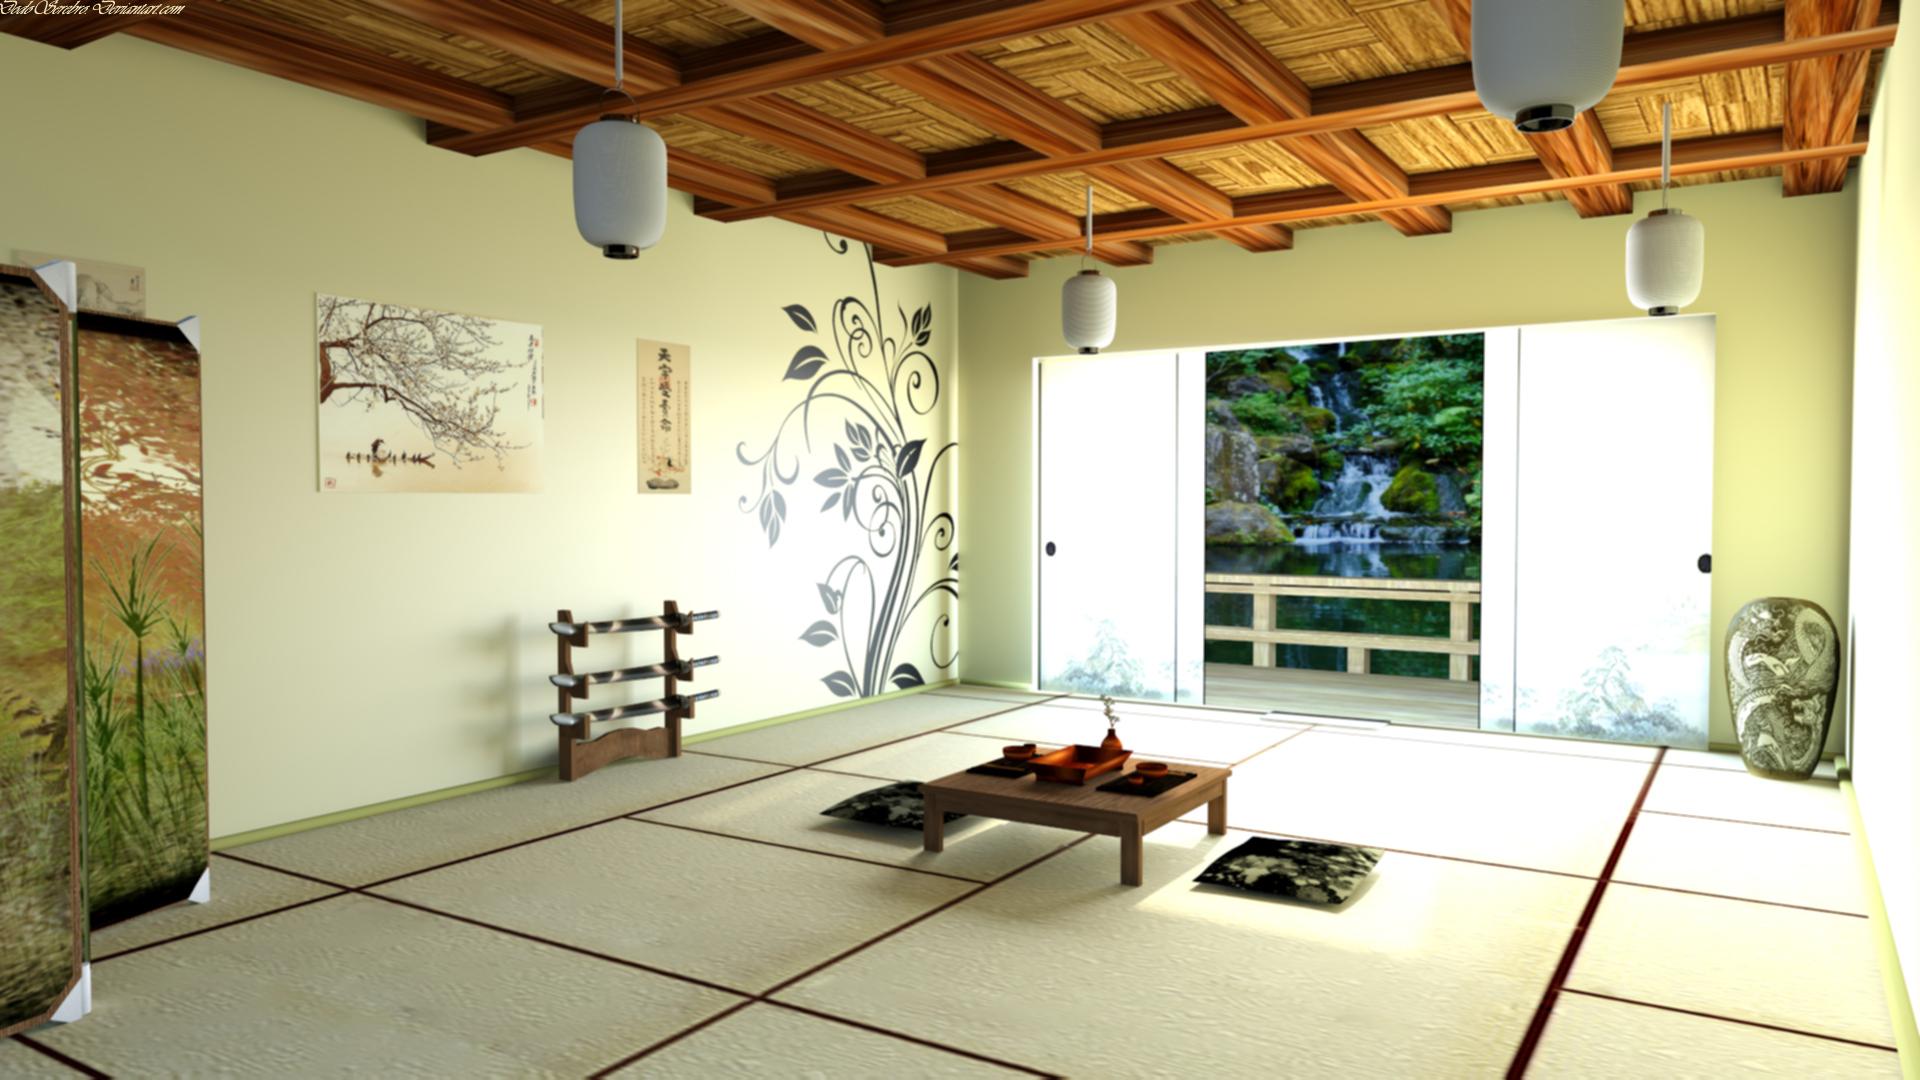 Japanese tea house interior - Filename Japanese_tea_room_by_dodoserebro D5c8a0z Jpg